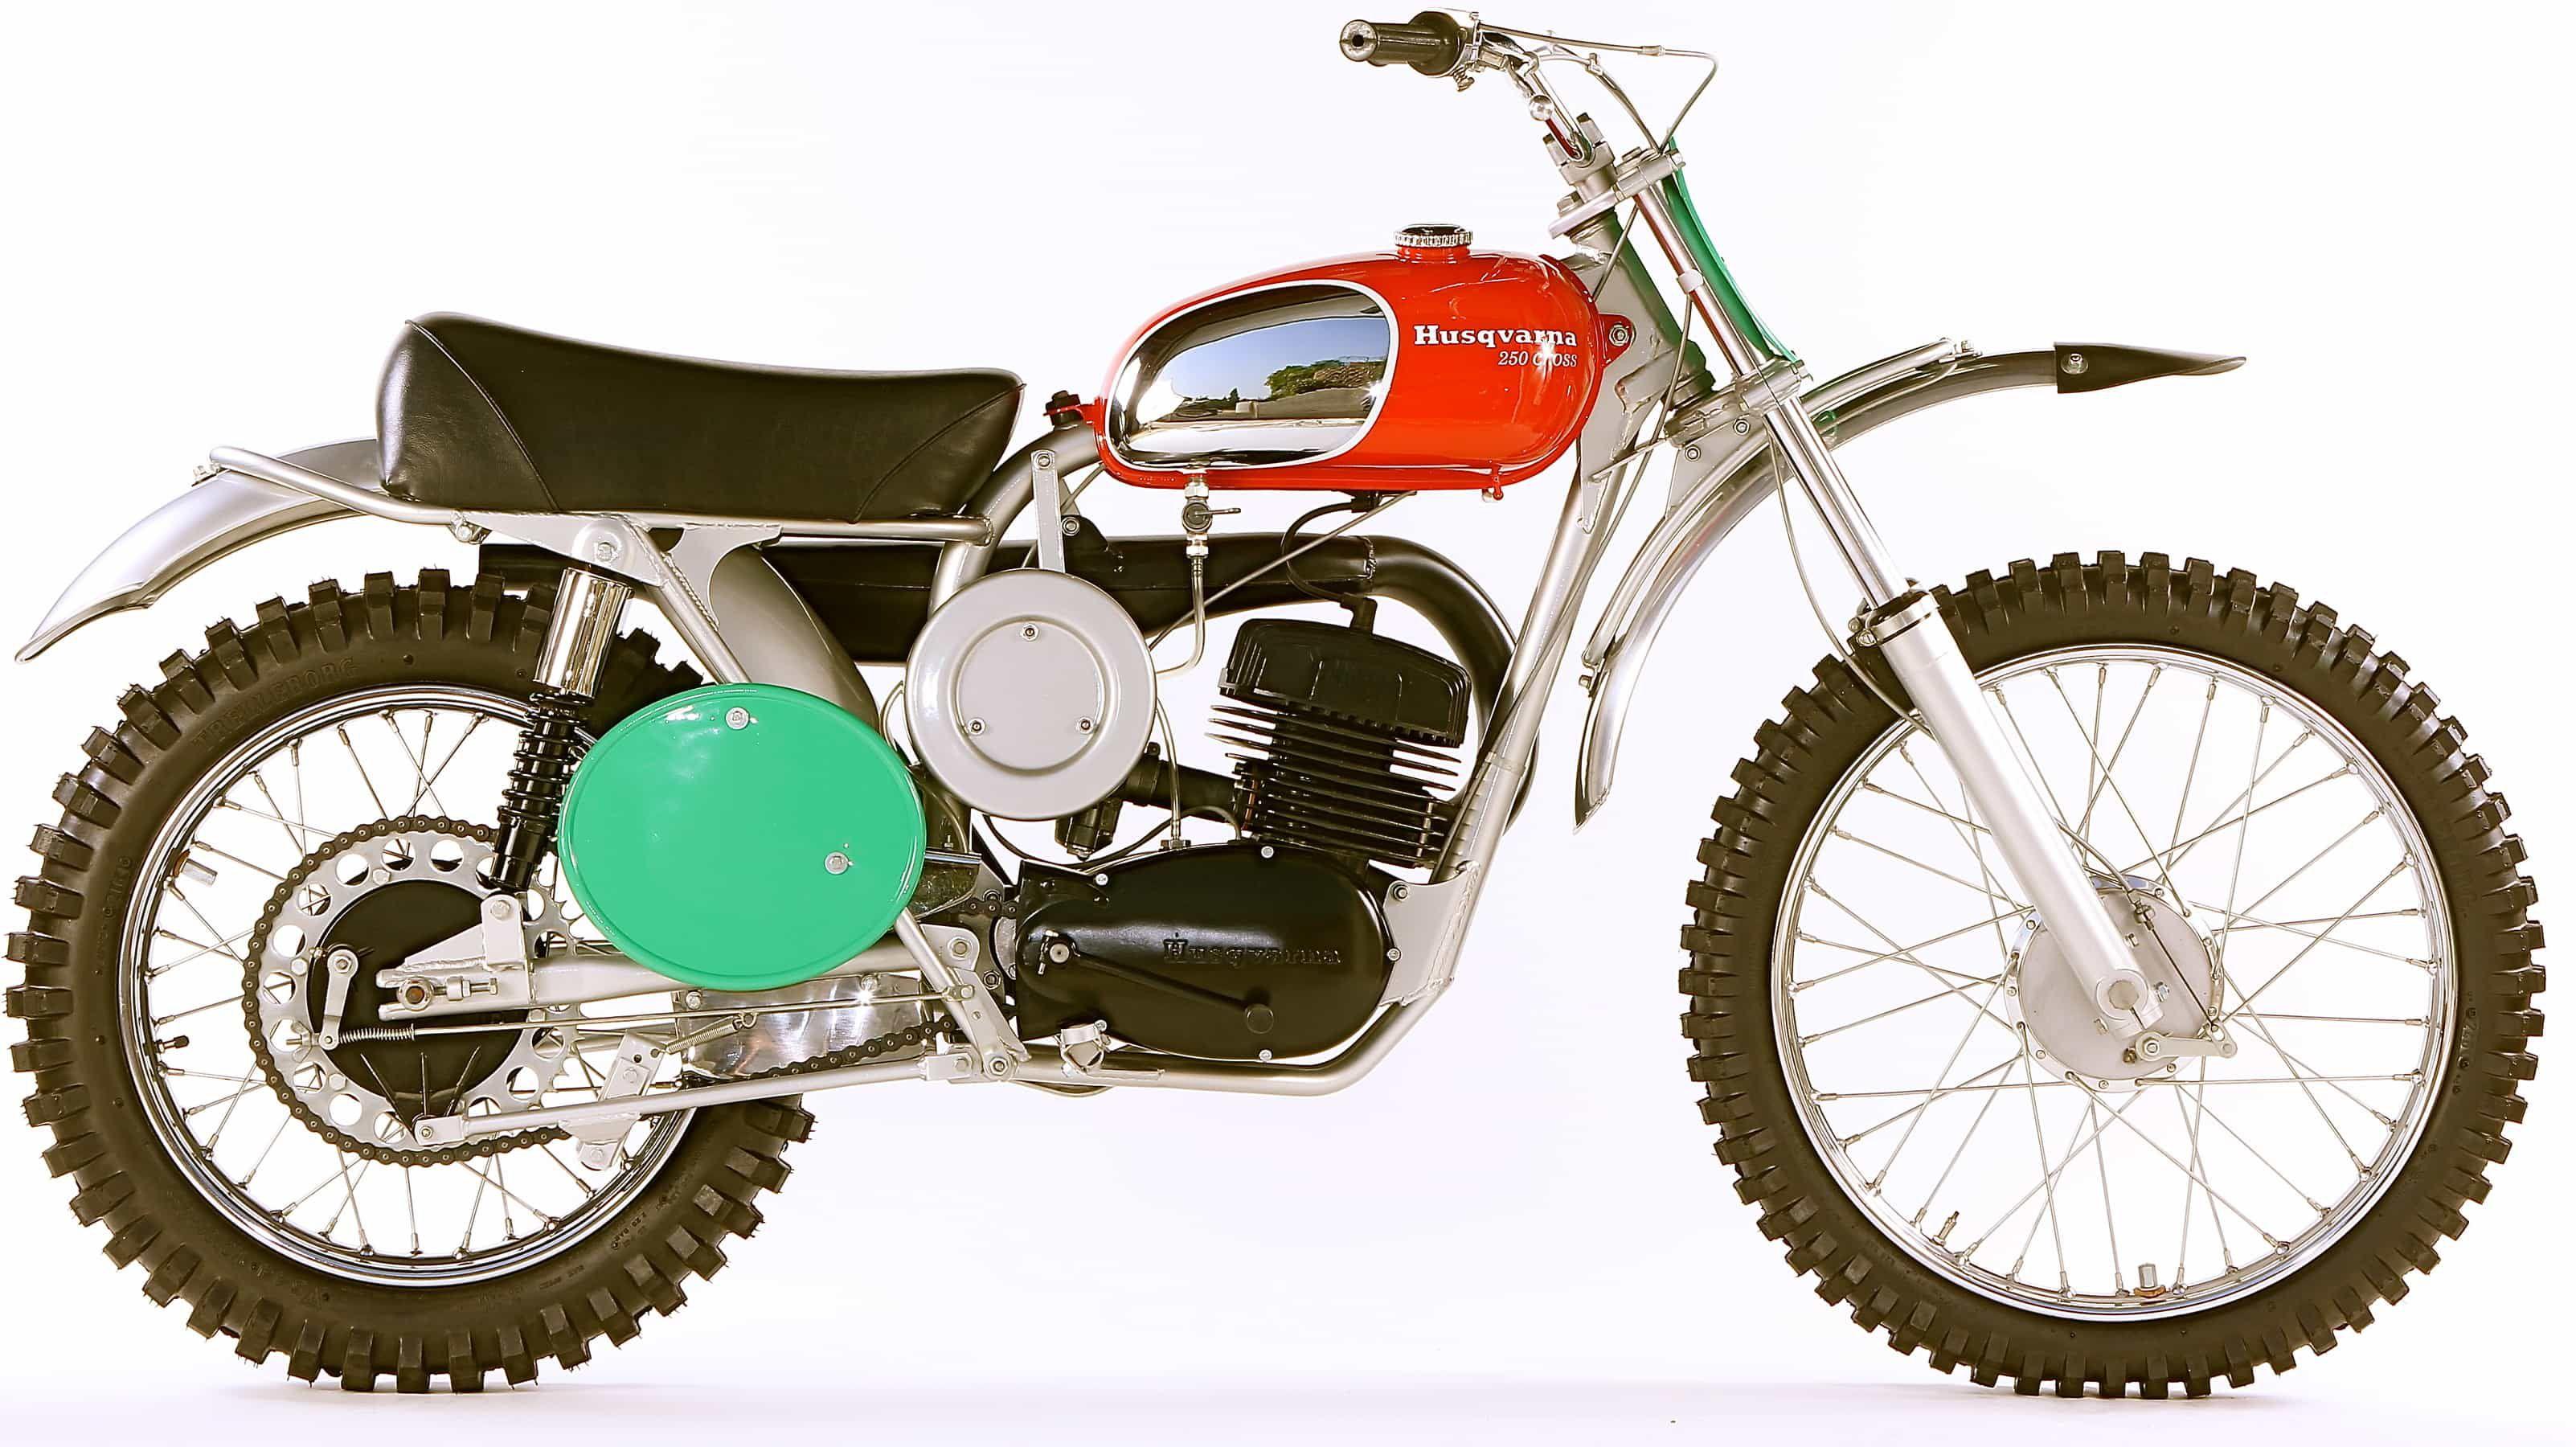 Husqvarna 250 MX